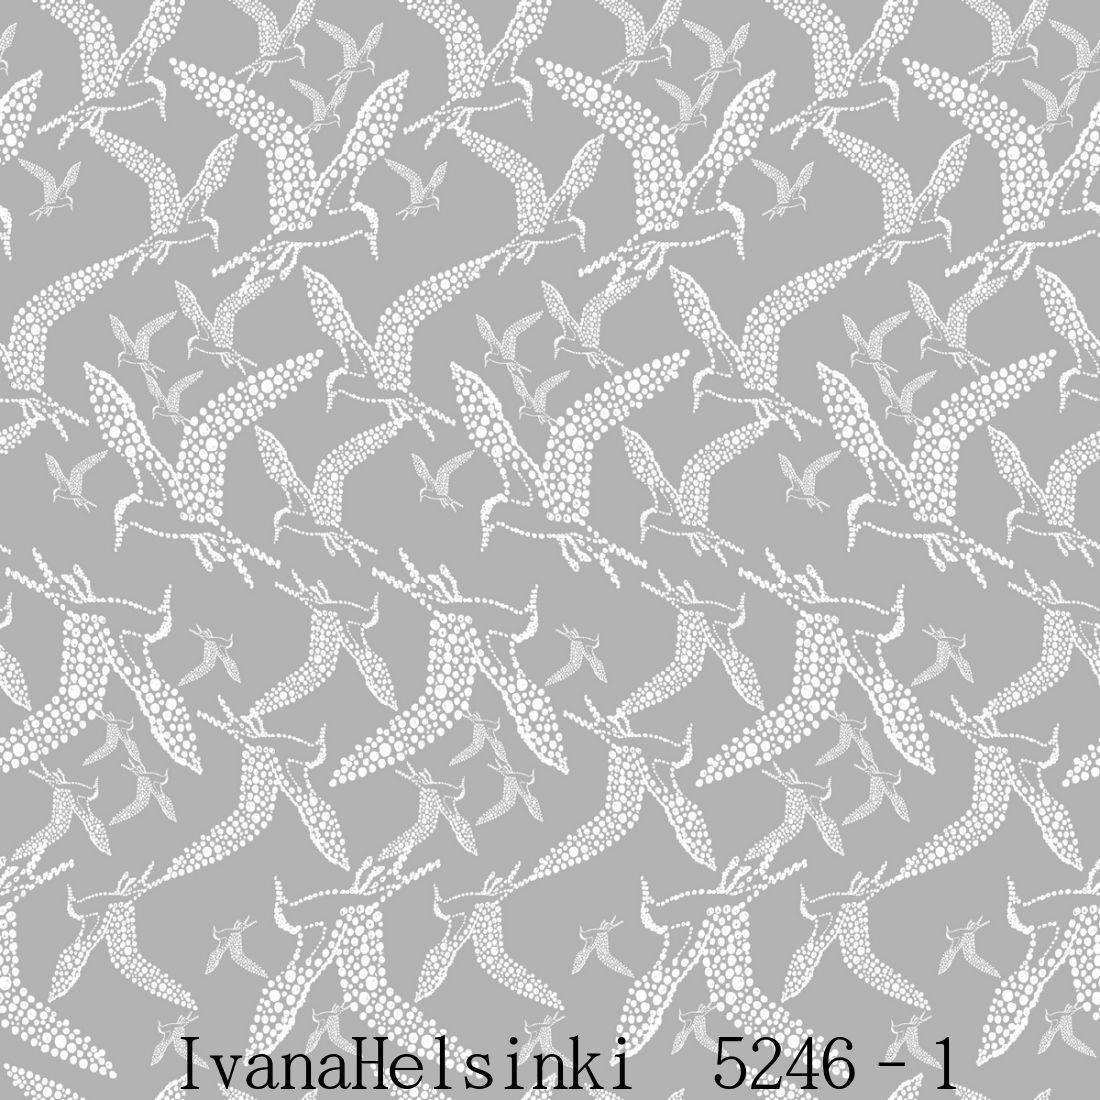 IvanaHelsinki イヴァナヘルシンキフィンランド製 壁紙5246-1【 53cm幅×10m巻 】裏面:フリース素材鳥 北欧 自然 グレー輸入壁紙IvanaHelsinki Wallpaper★P10倍★